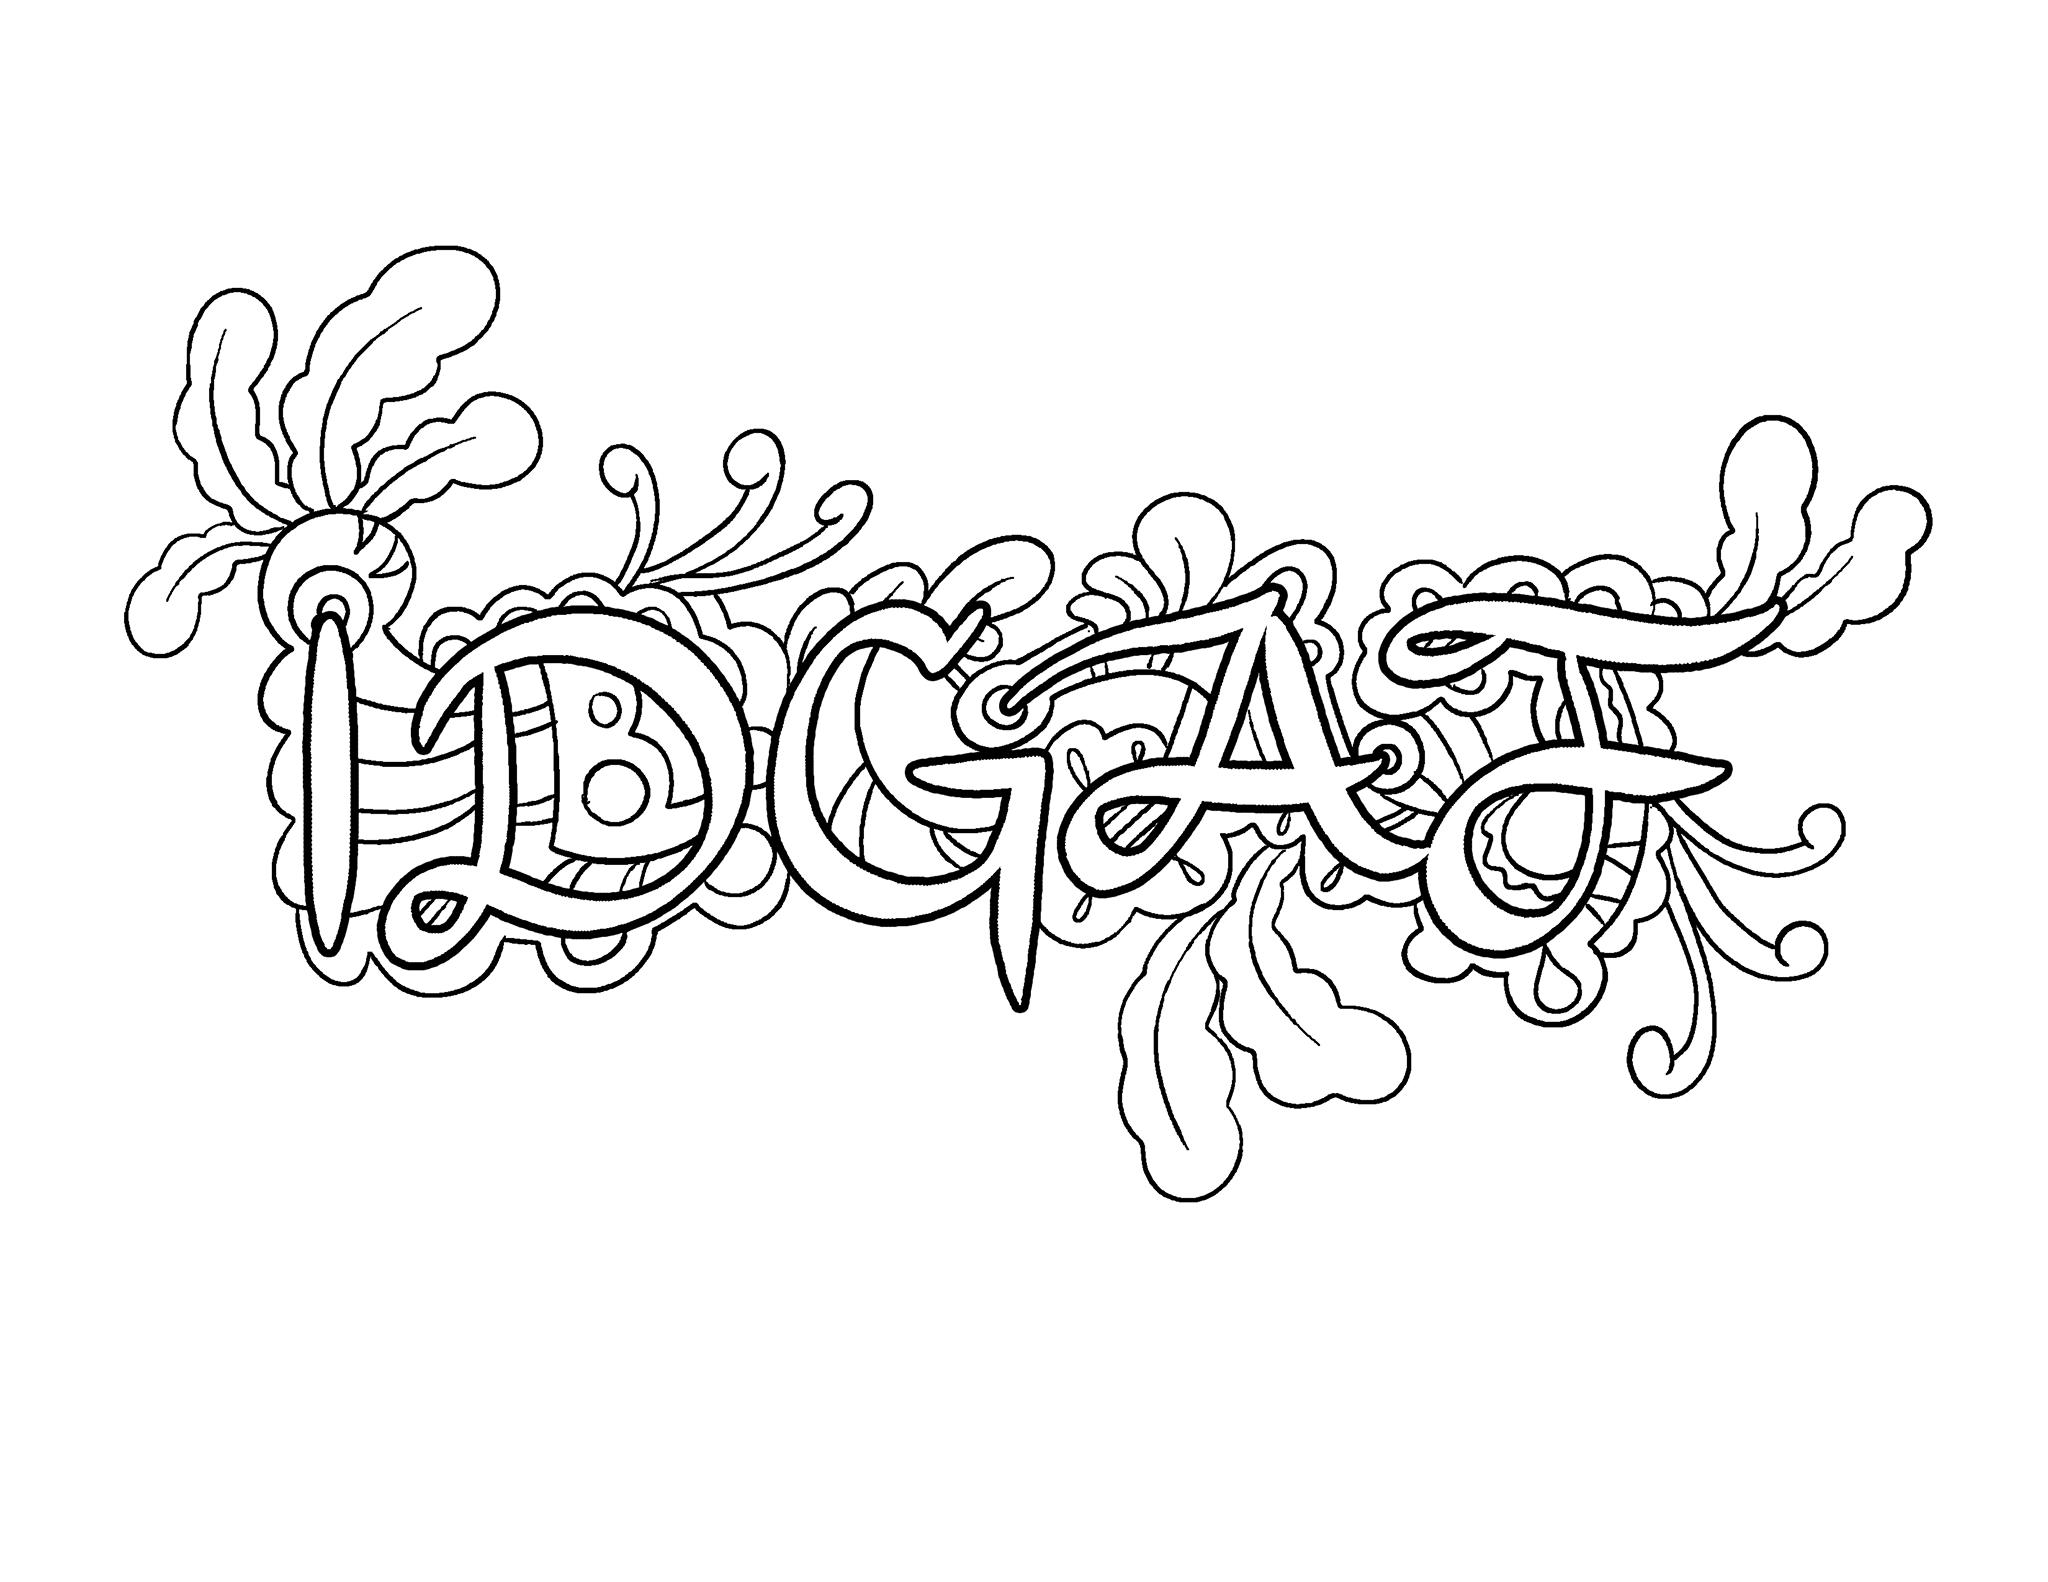 2048x1582 Idgaf Coloring Page